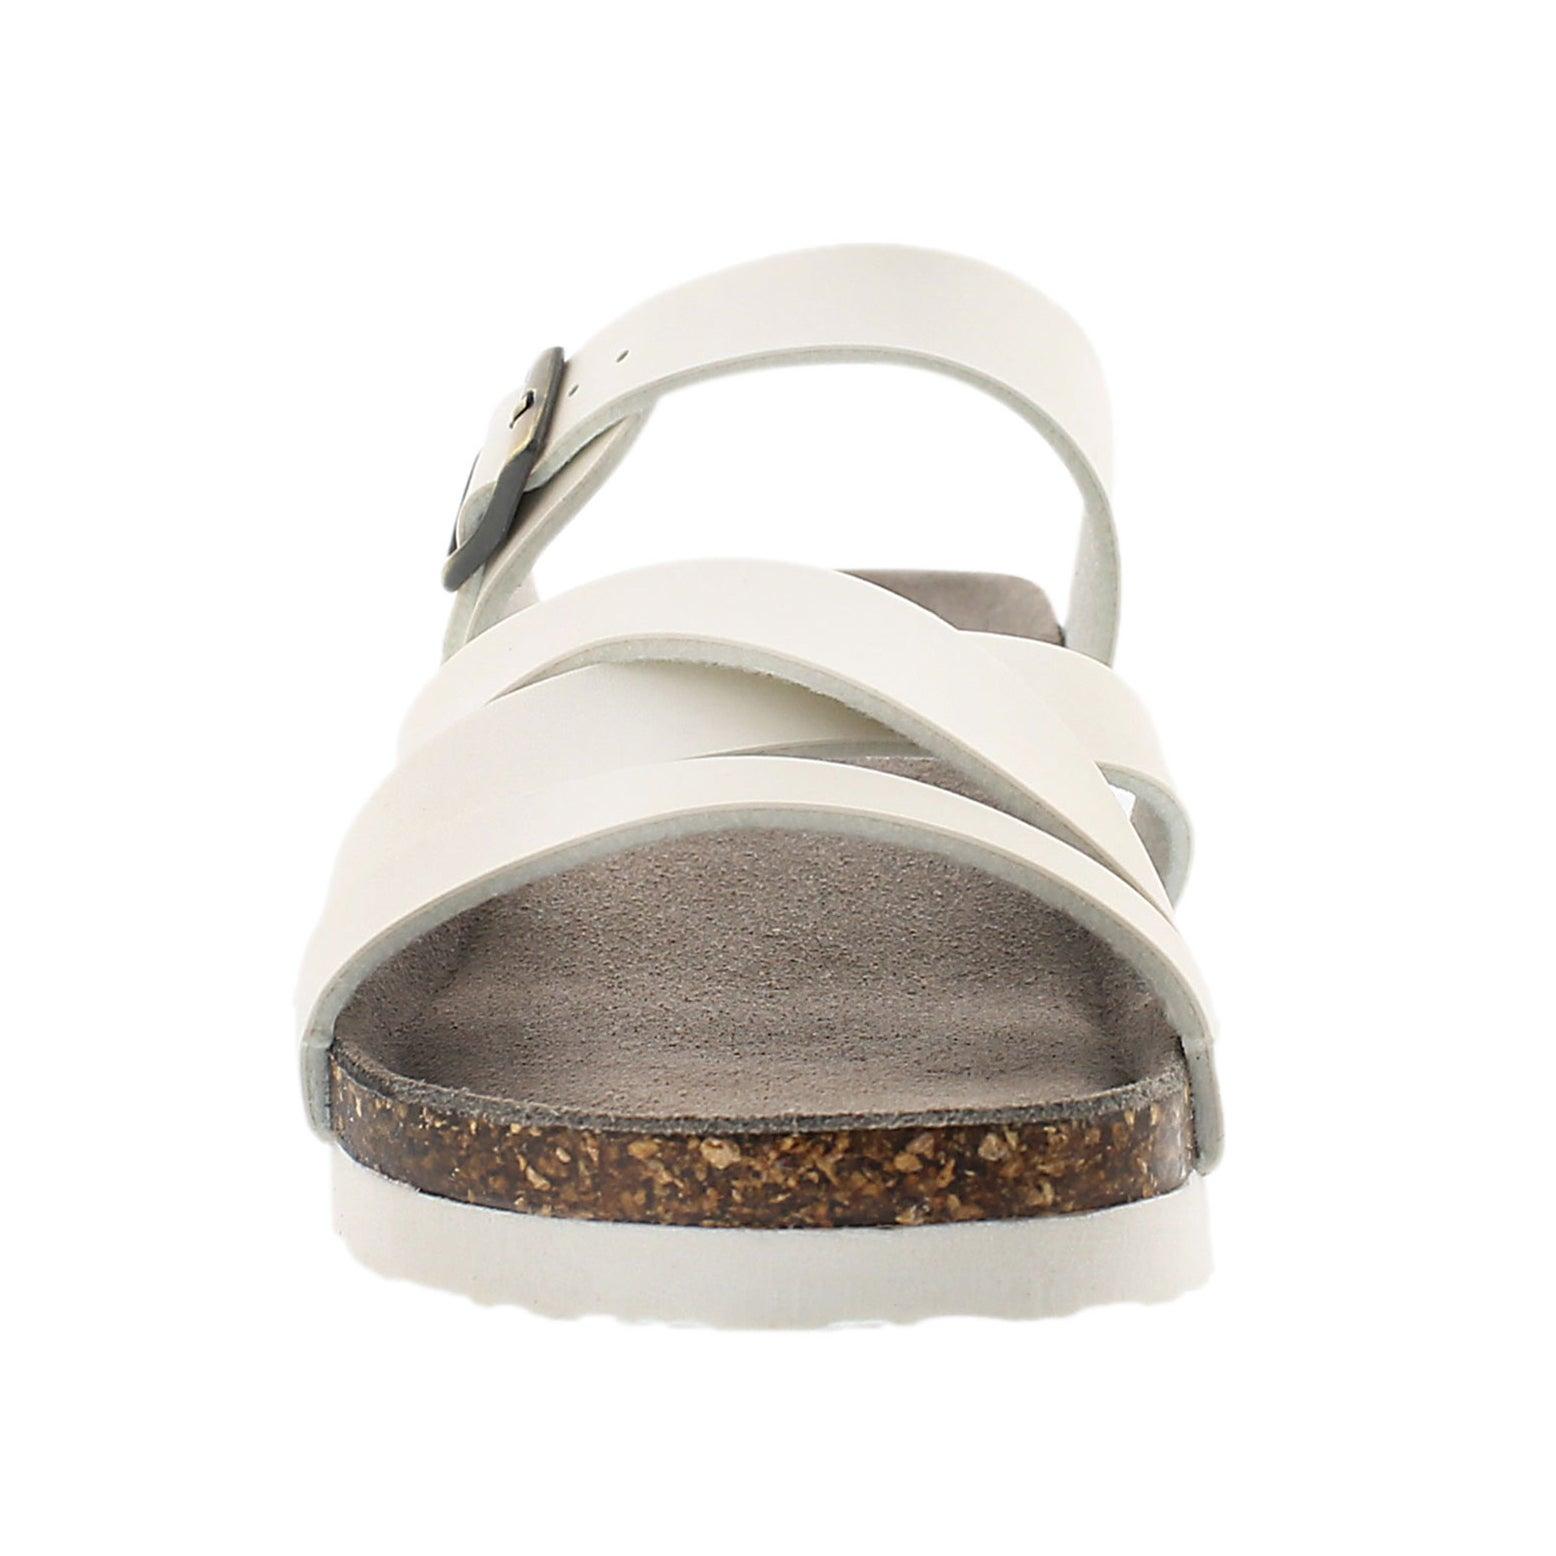 Lds Ginnie white mem. foam wdge sandal